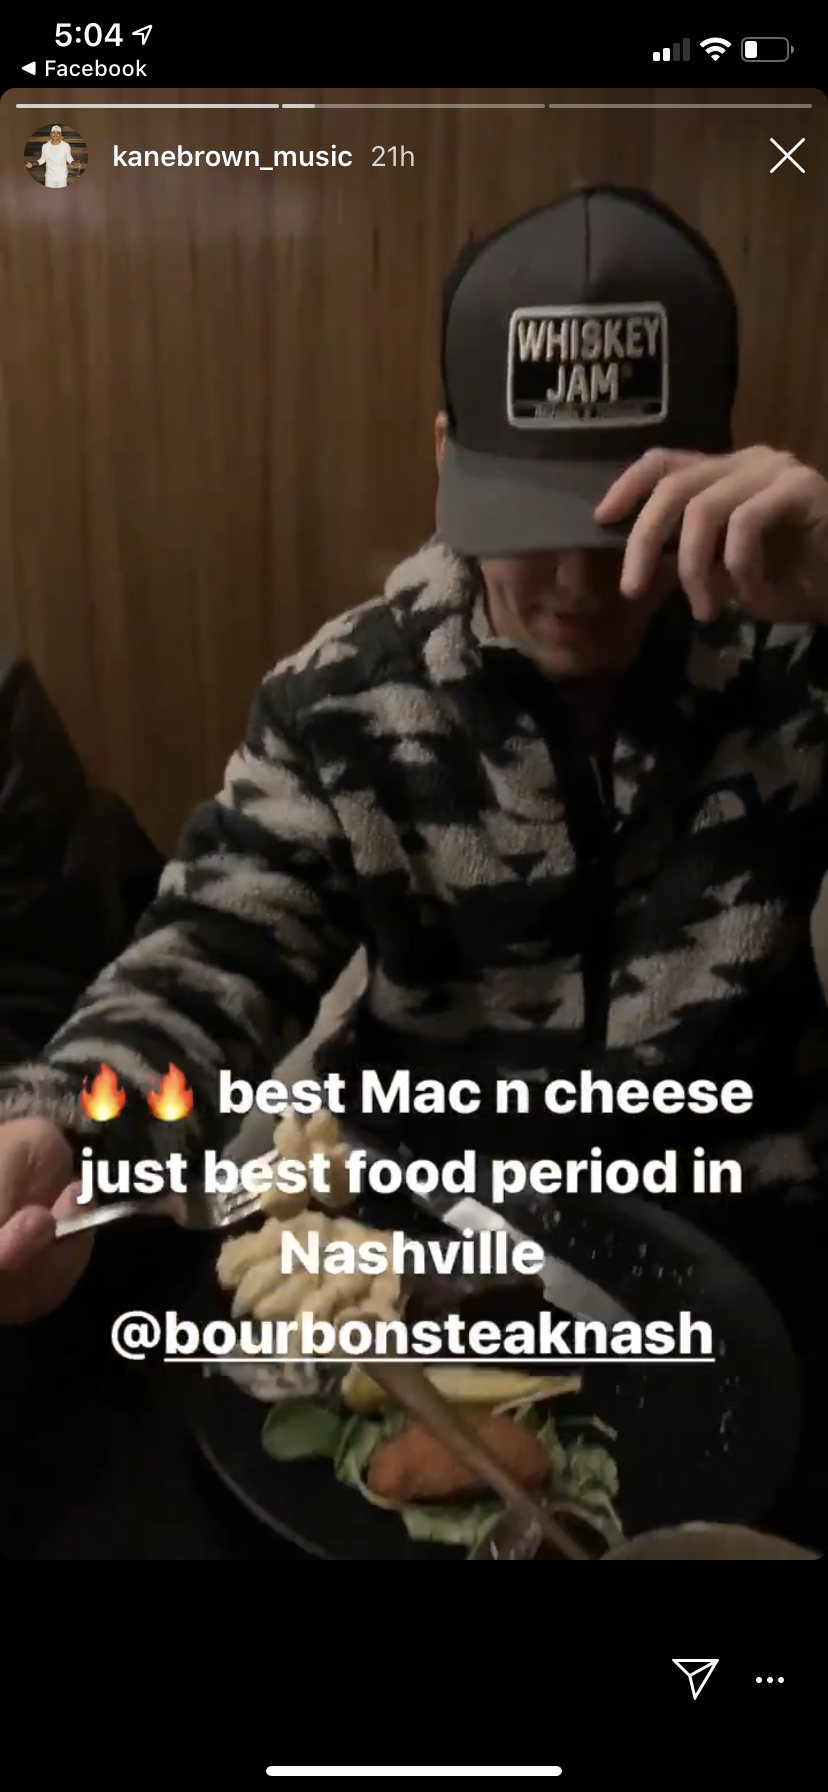 Pin By Cassandra On Nashville Bucket List Best Mac And Cheese Best Mac Nashville